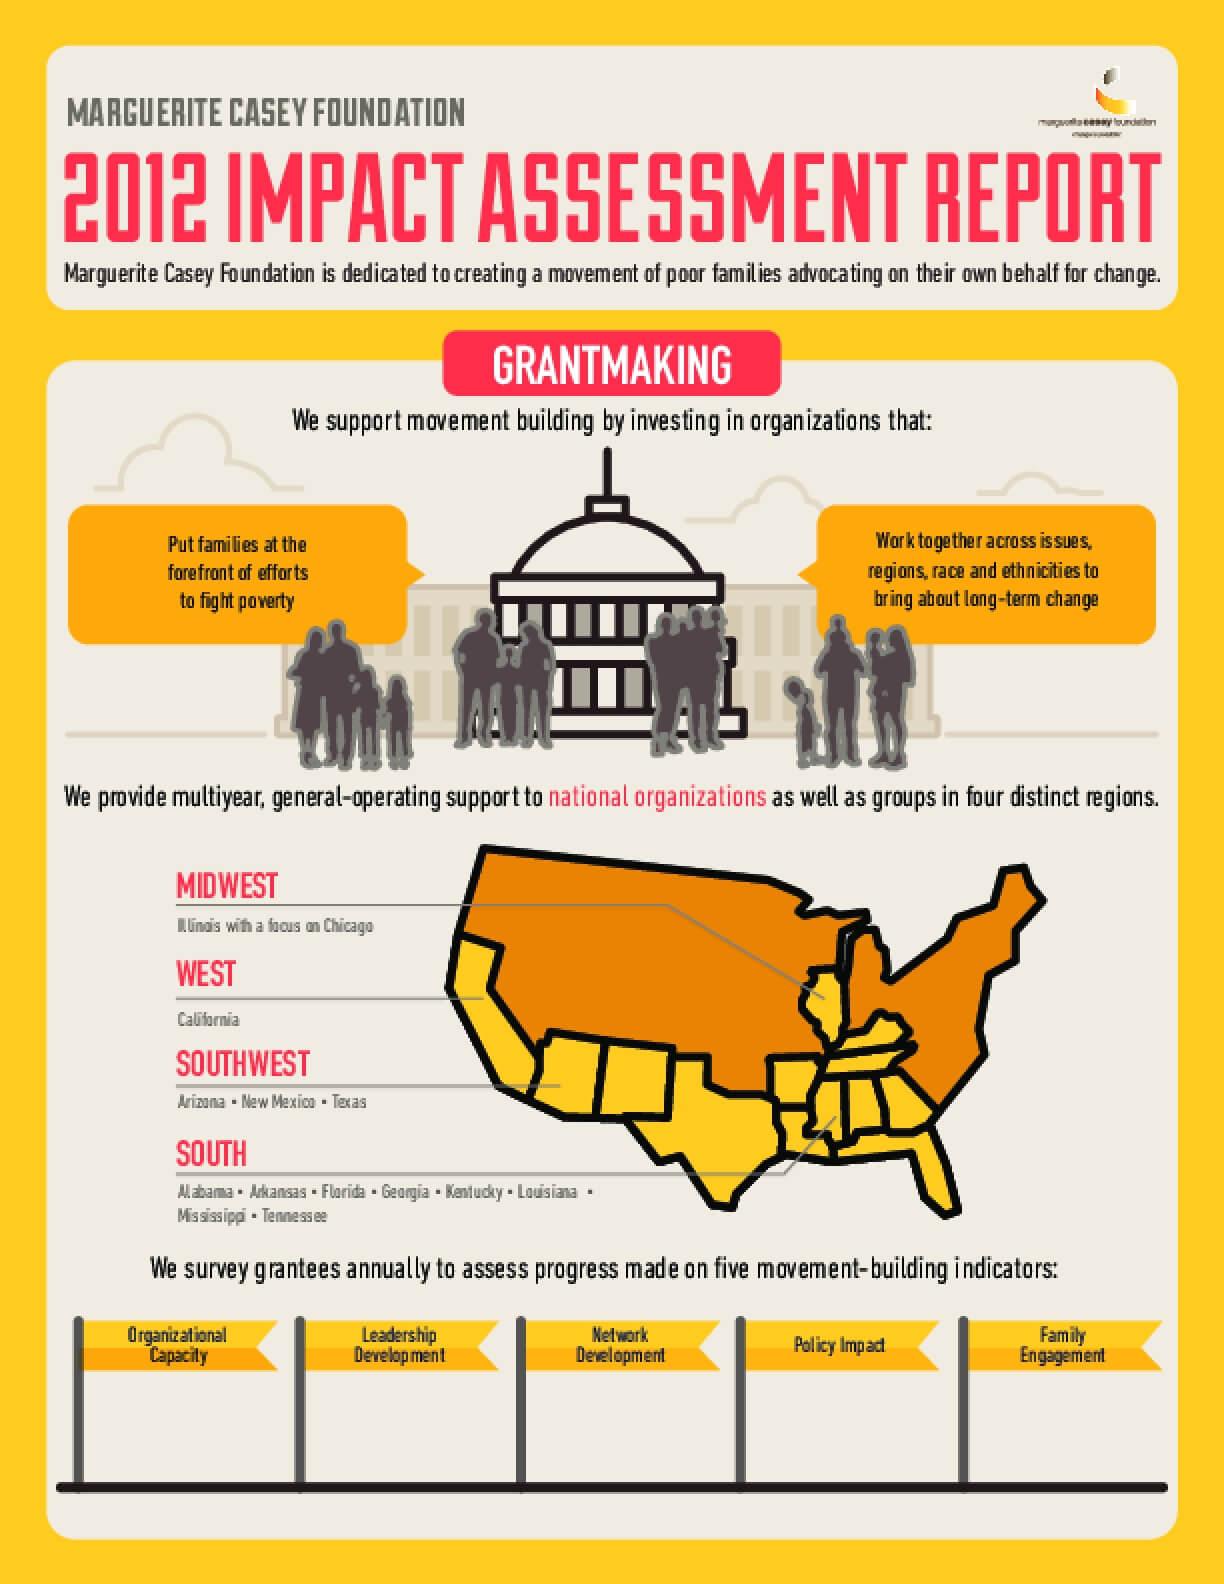 Marguerite Casey Foundation 2012 Impact Assessment Report